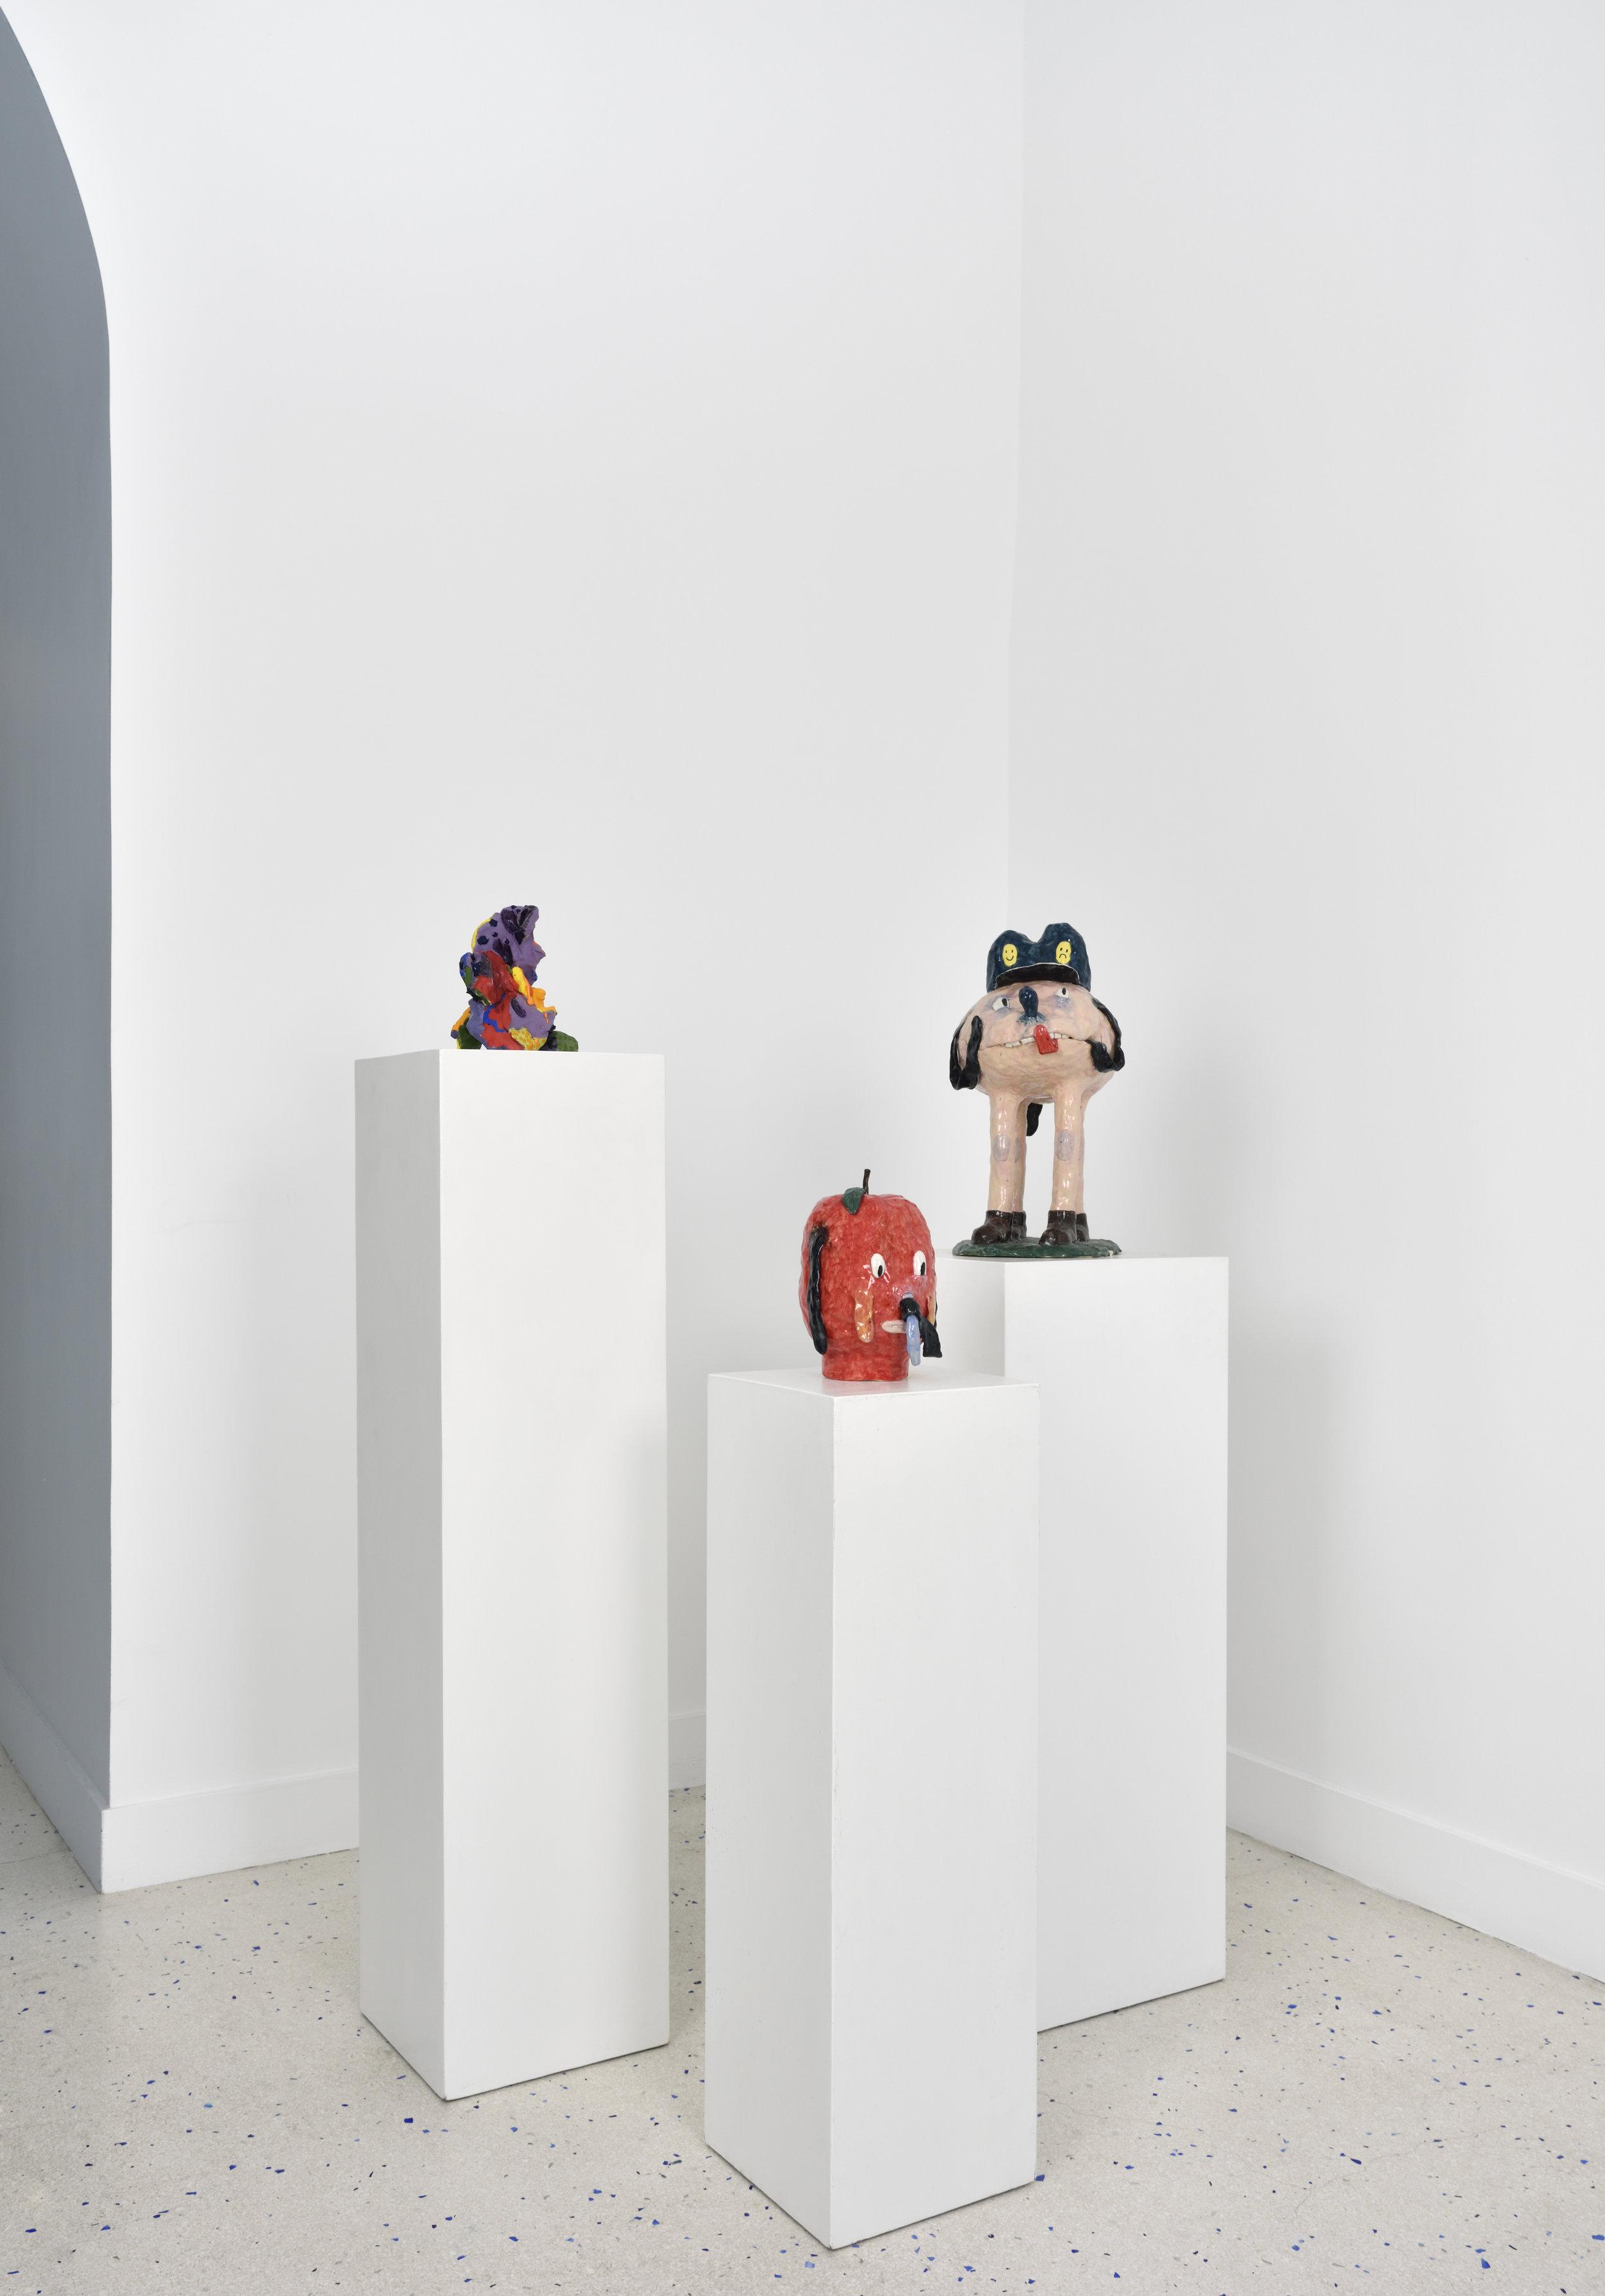 Crédit Photo Rebecca Fanuele © Courtesy of Galerie Lefebvre, Anabel Juarez & Joakim Ojanen